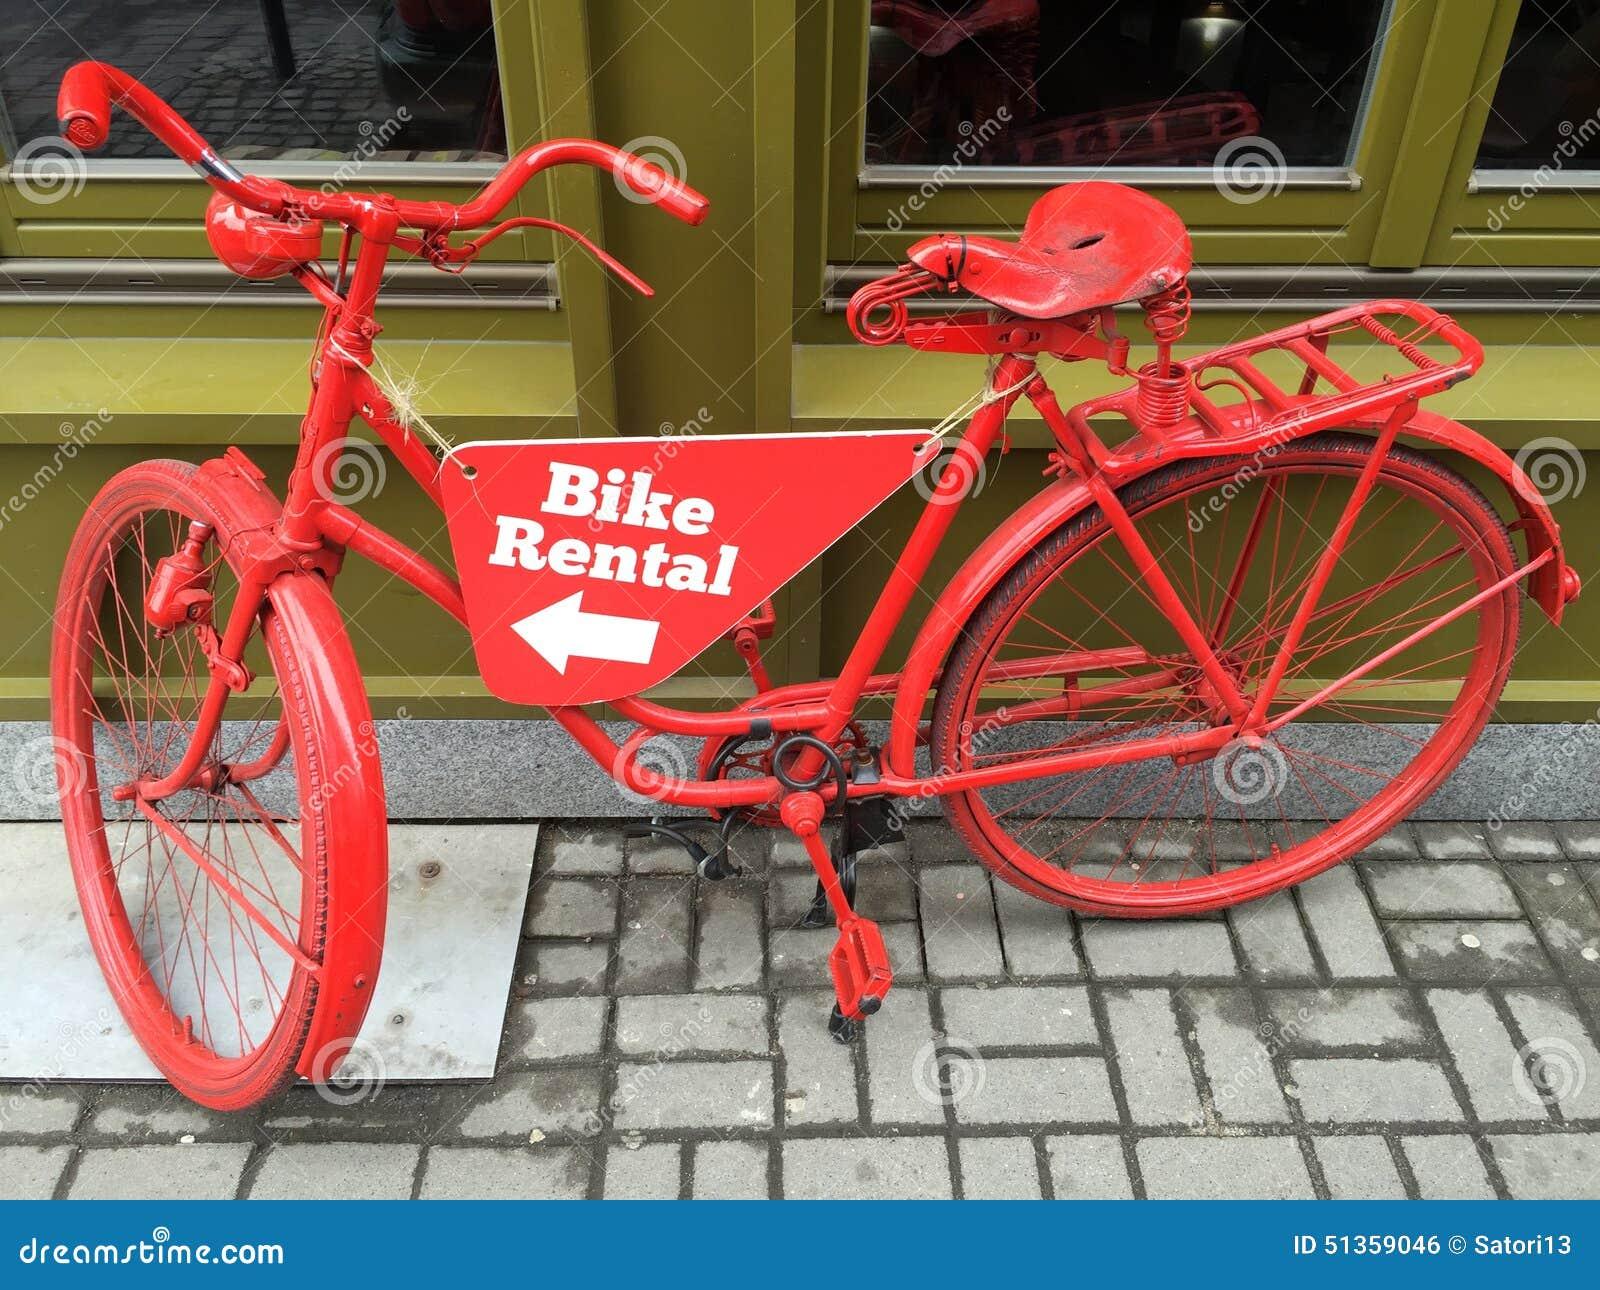 Bike Rental Stock Photo Image 51359046